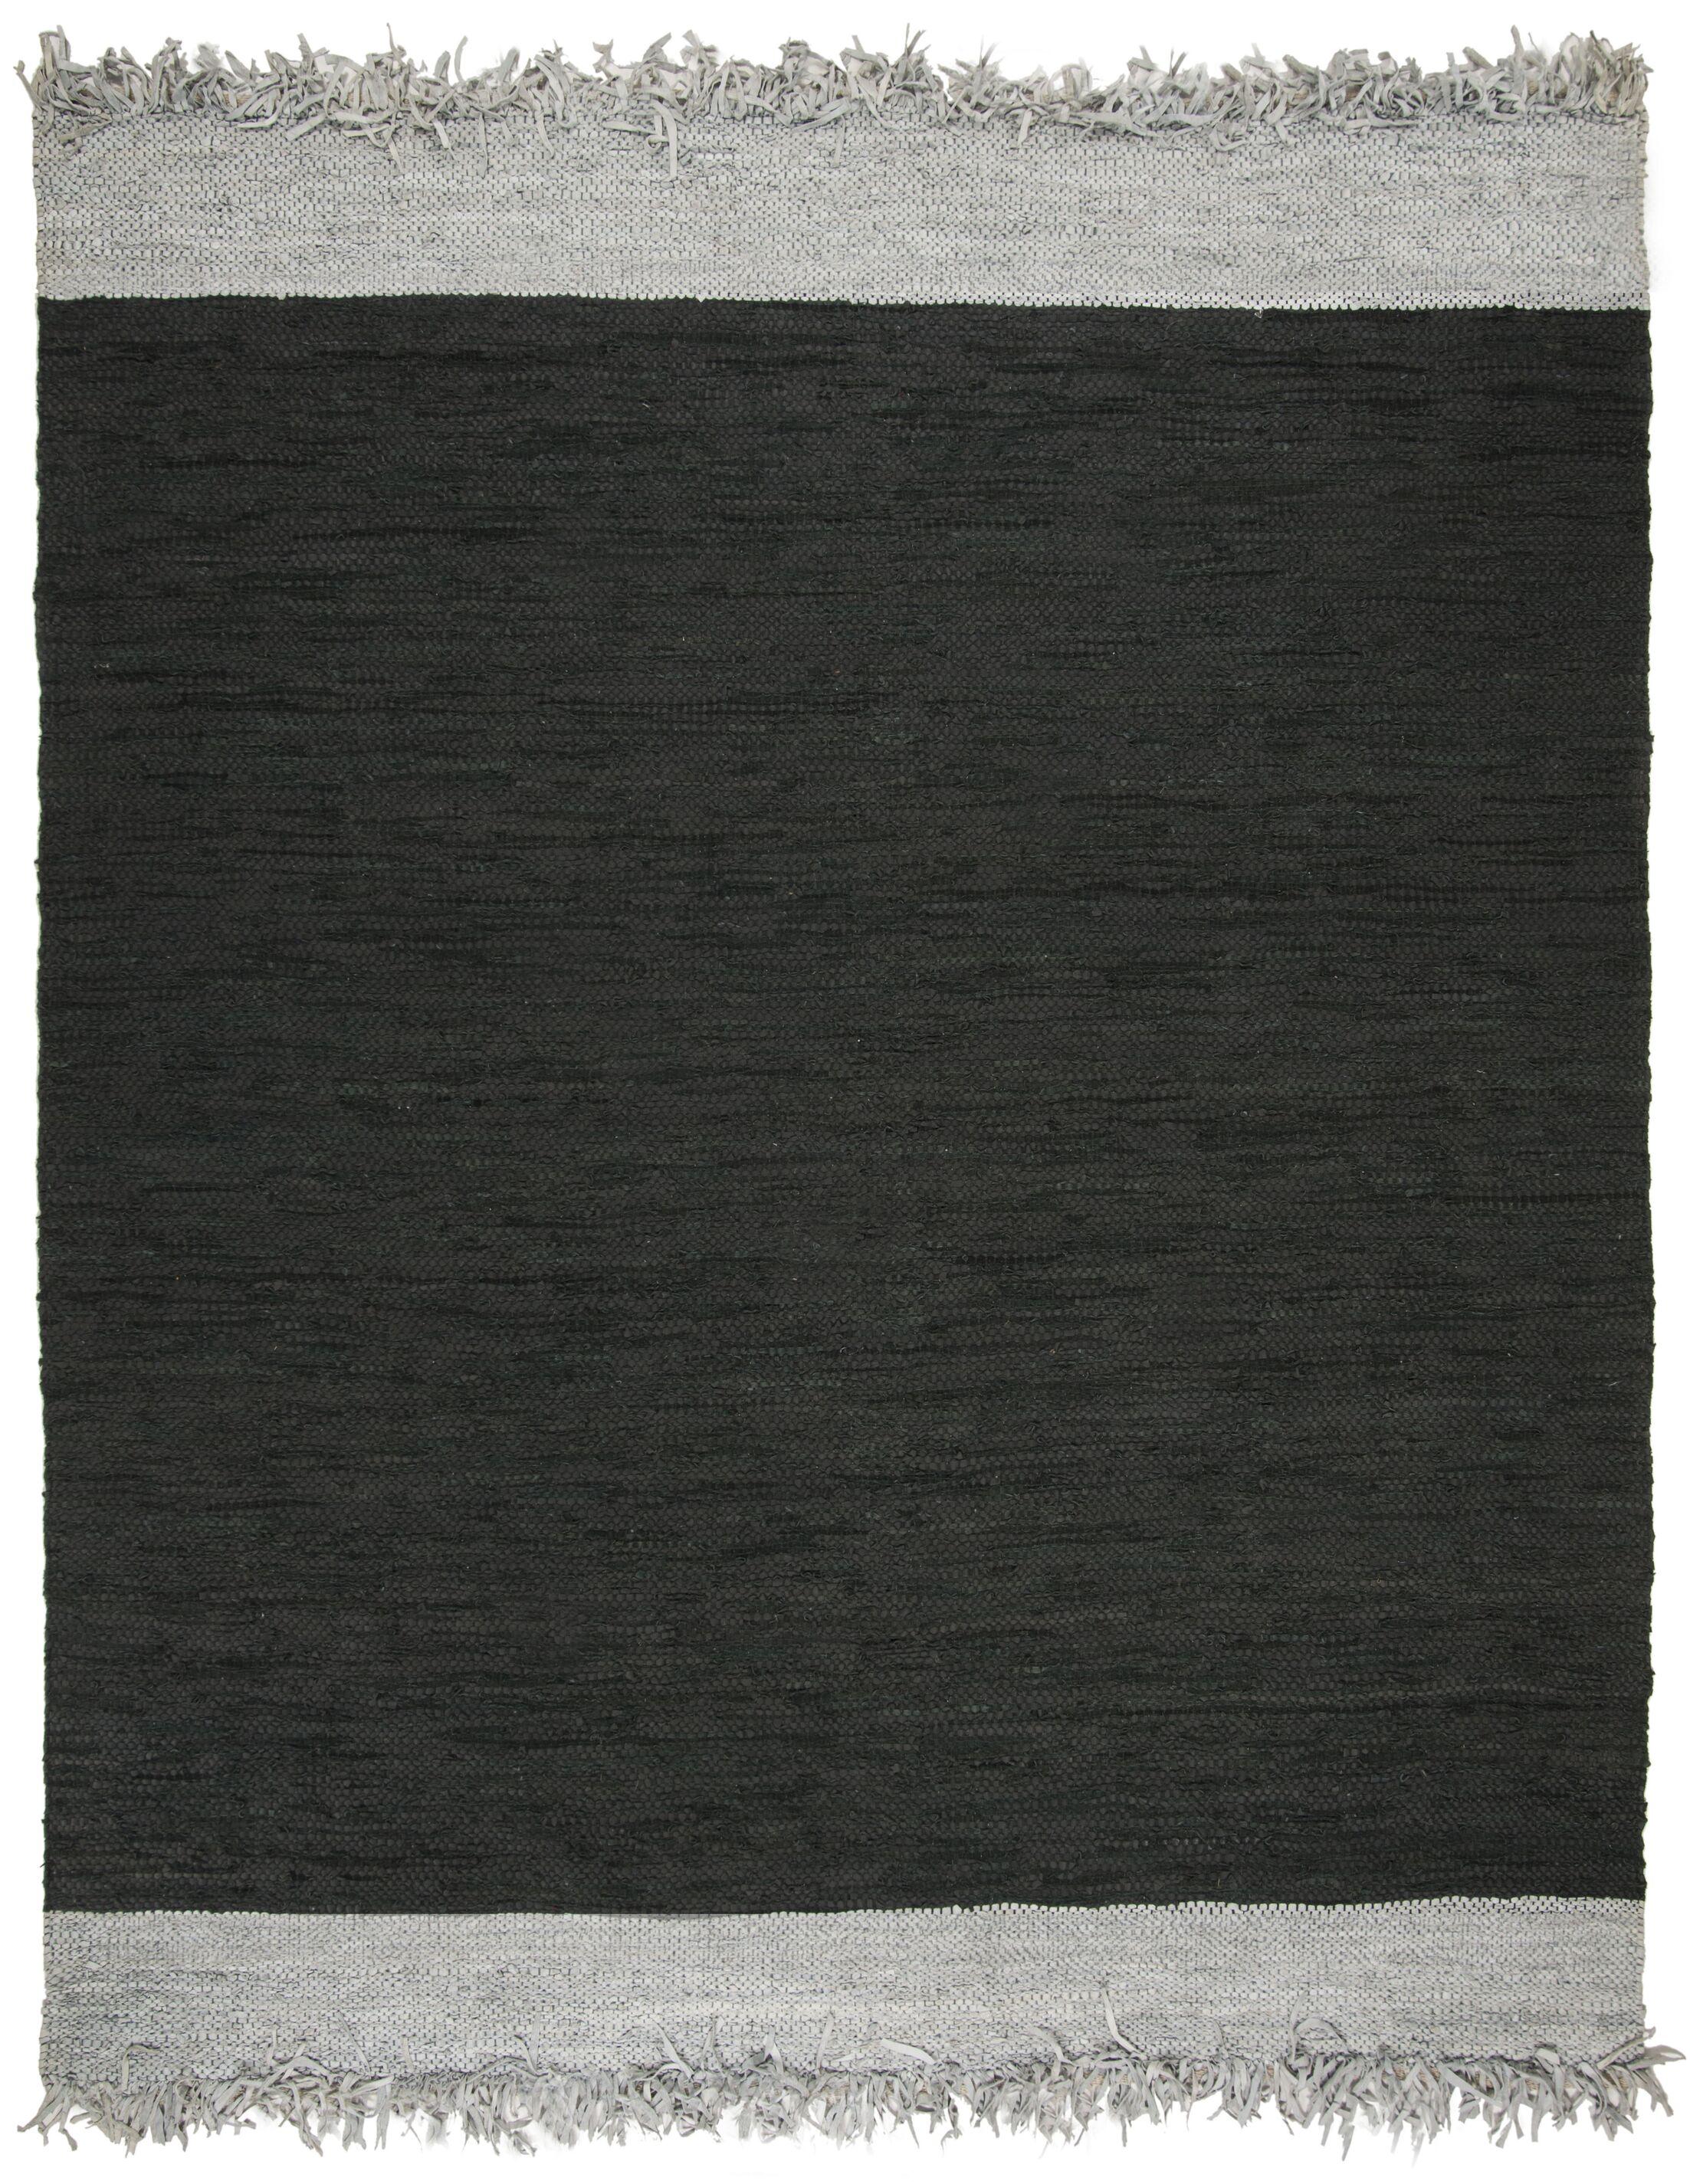 Dahlia Handwoven Vintage Light Gray/Black Area Rug Rug Size: Rectangle 4' x 6'